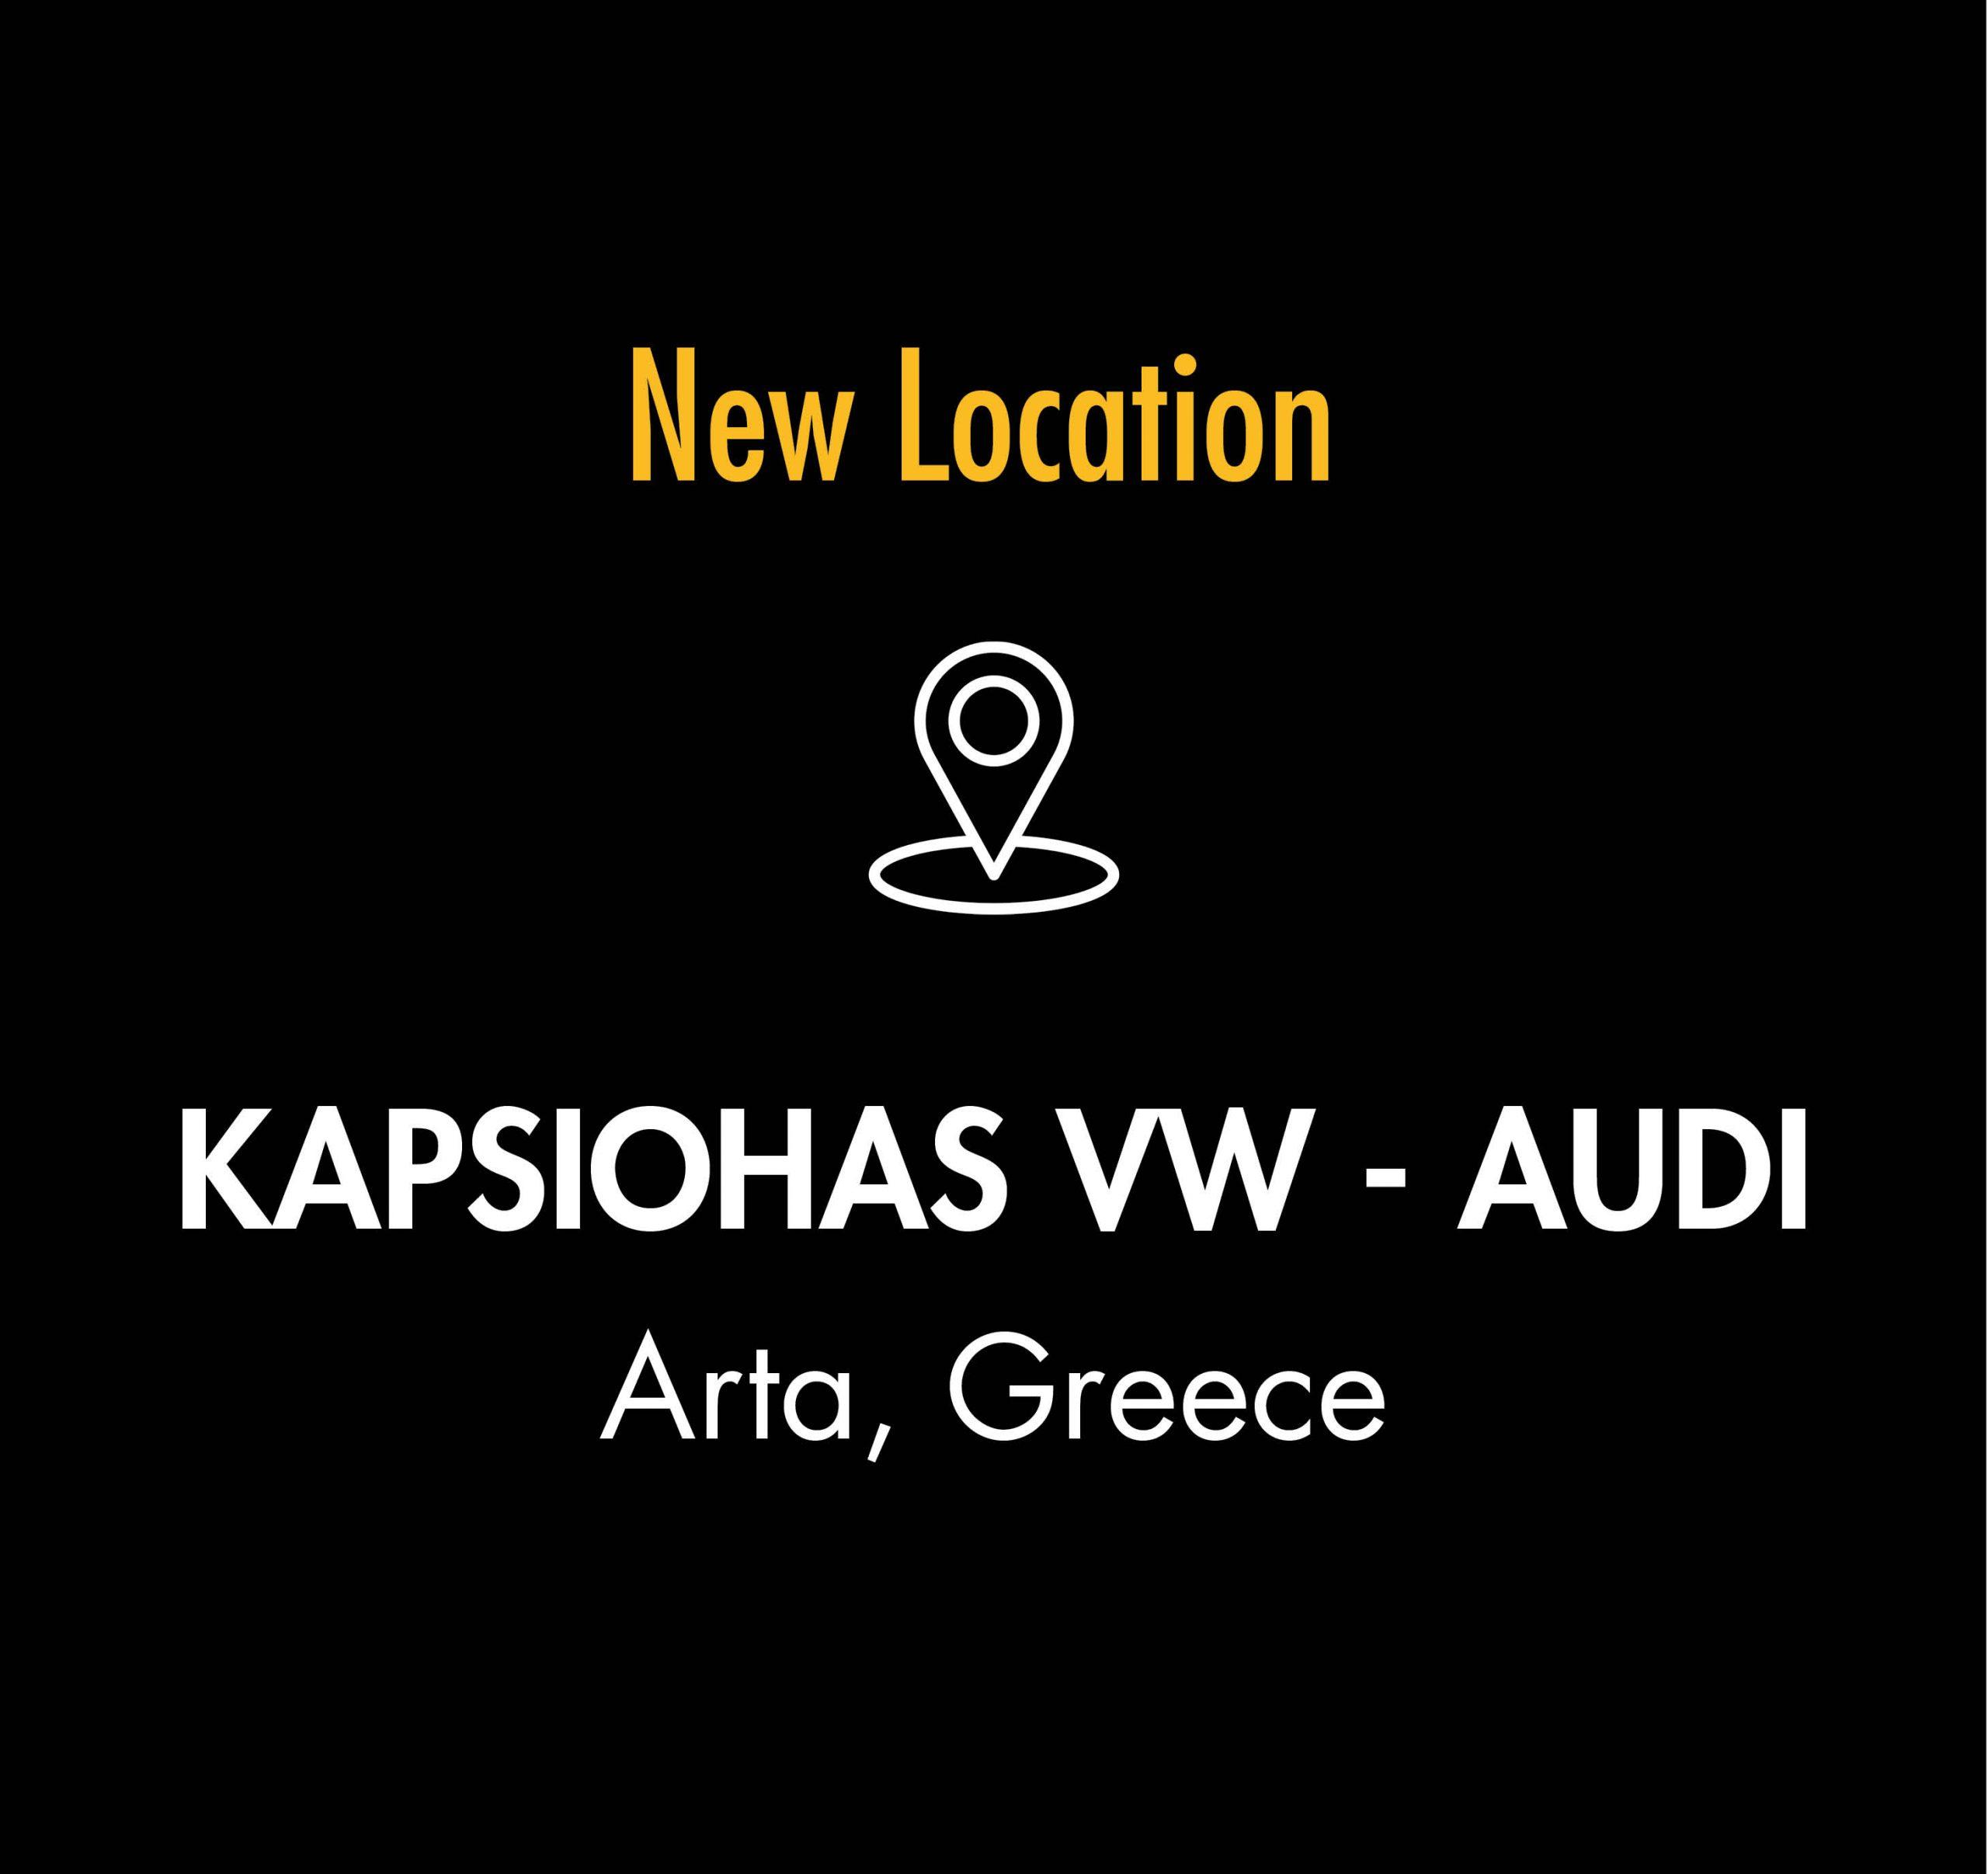 Kapsiohas VW-Audi_Arta